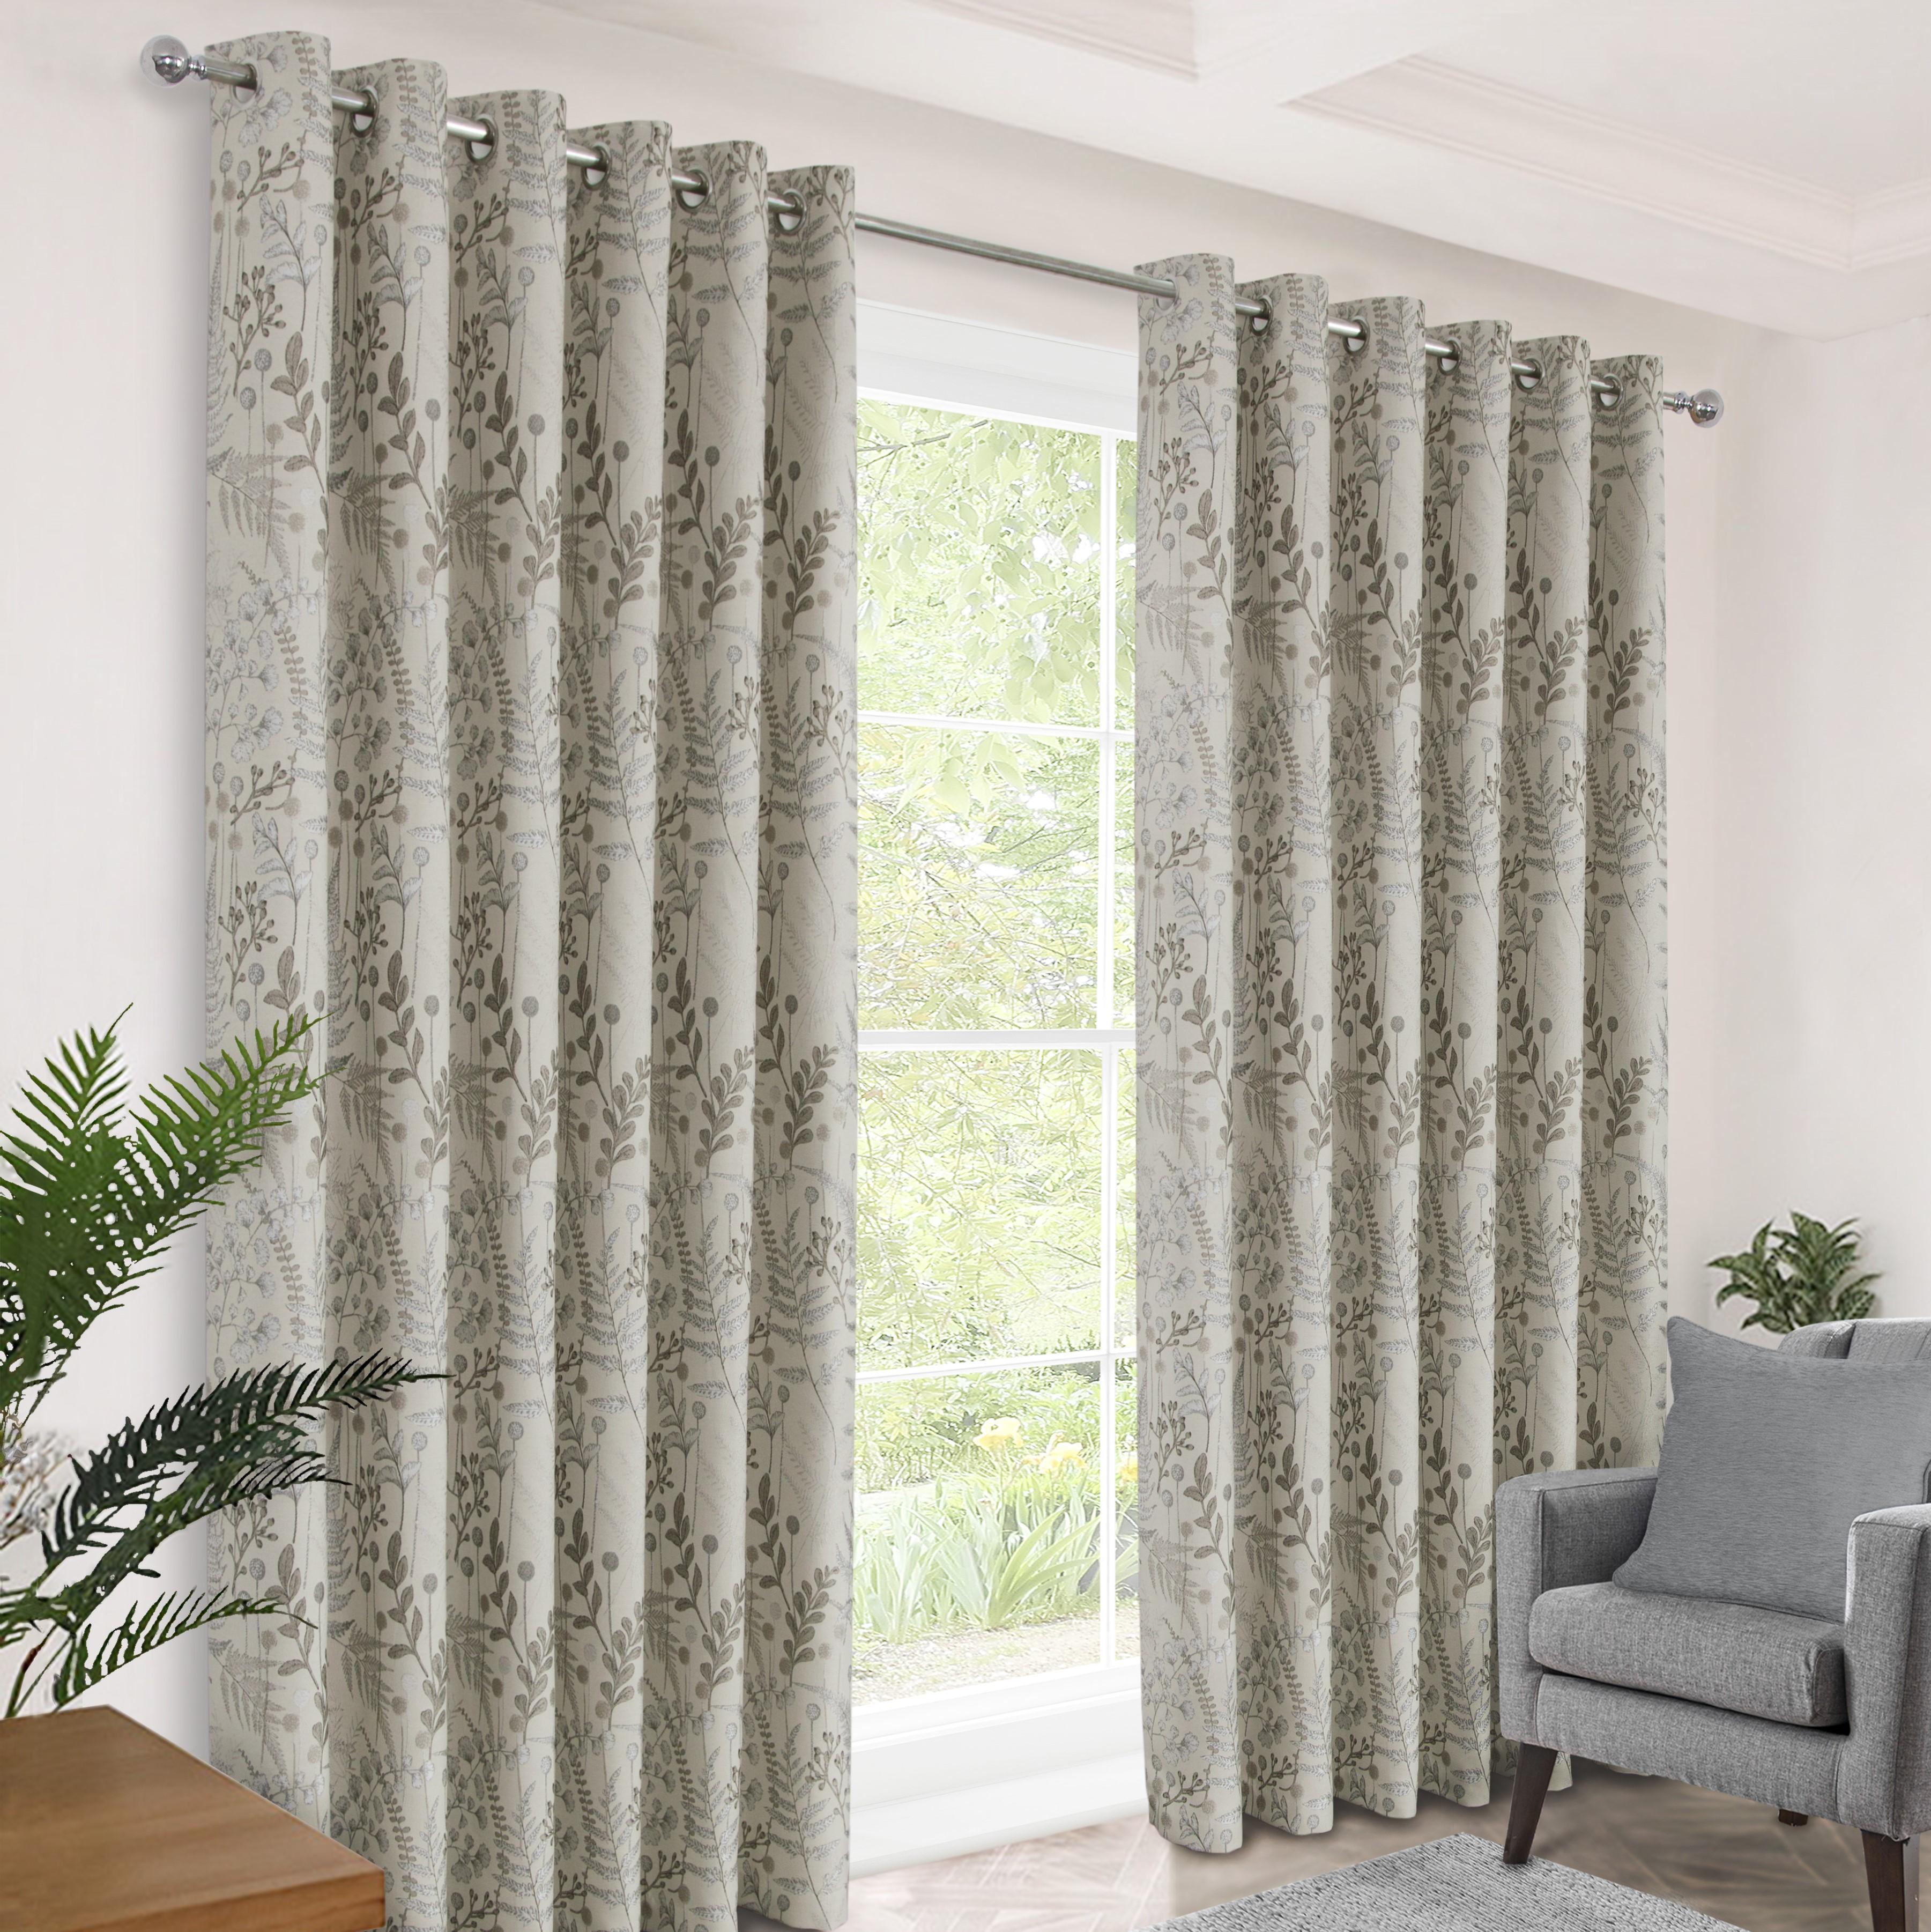 Foliage Birch Eyelet Curtains